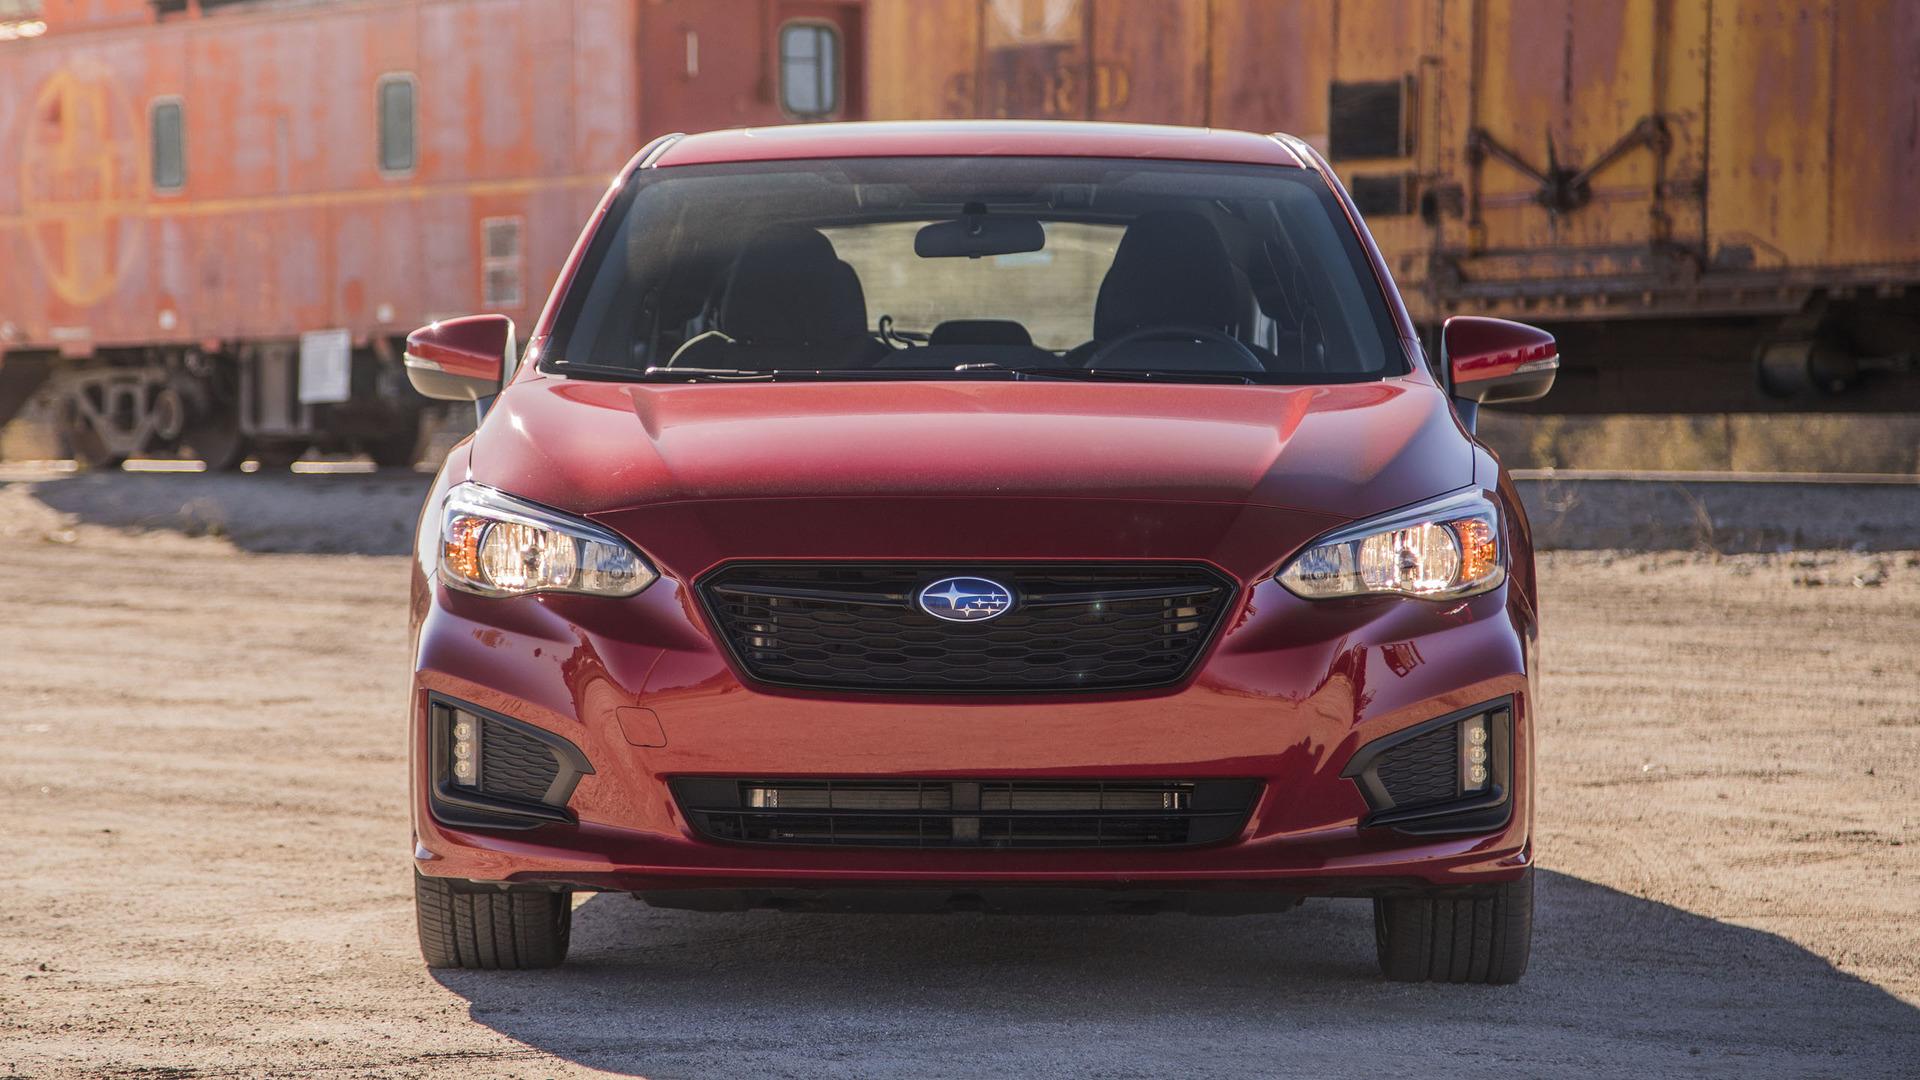 Subaru Recalls 33k Imprezas For Stalling